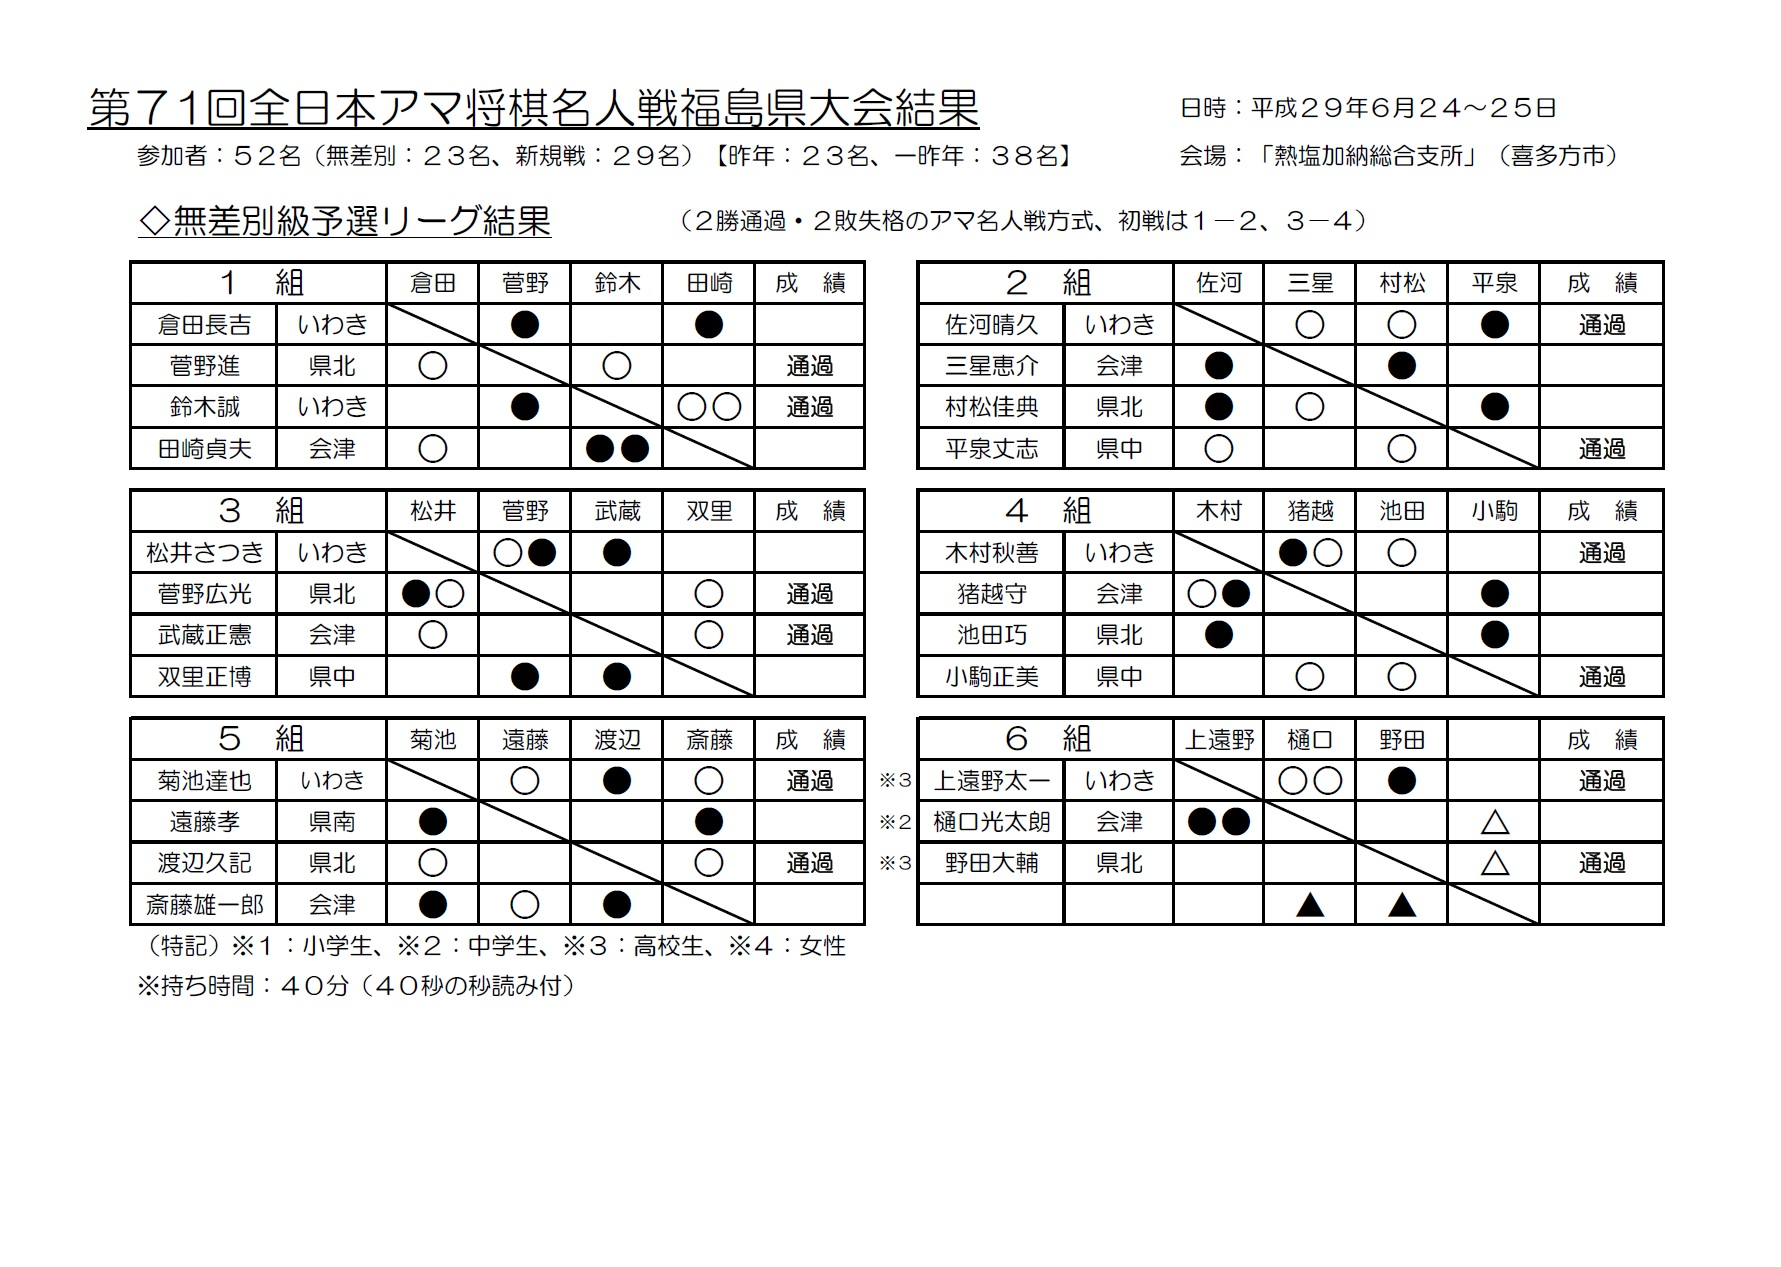 yosen_musabetu_20170625.jpg